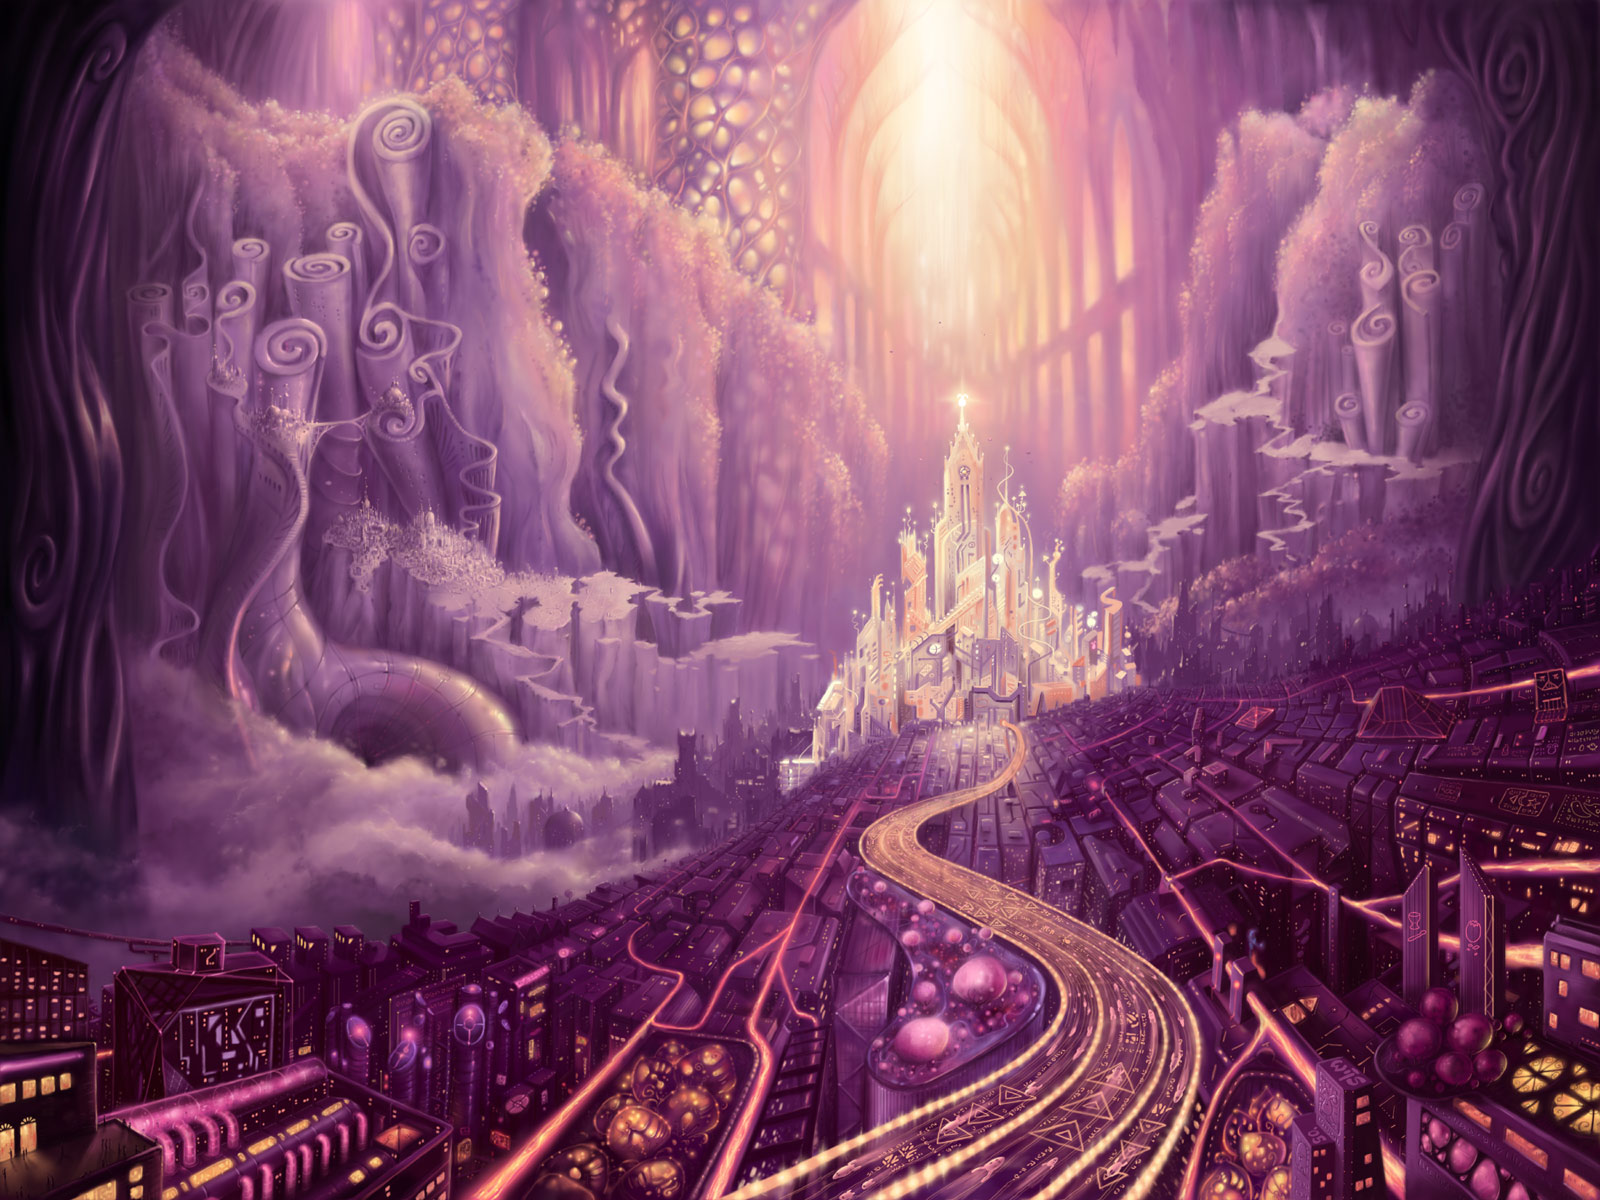 20 Amazing Beautiful Digital Art Desktop Wallpapers In Hd